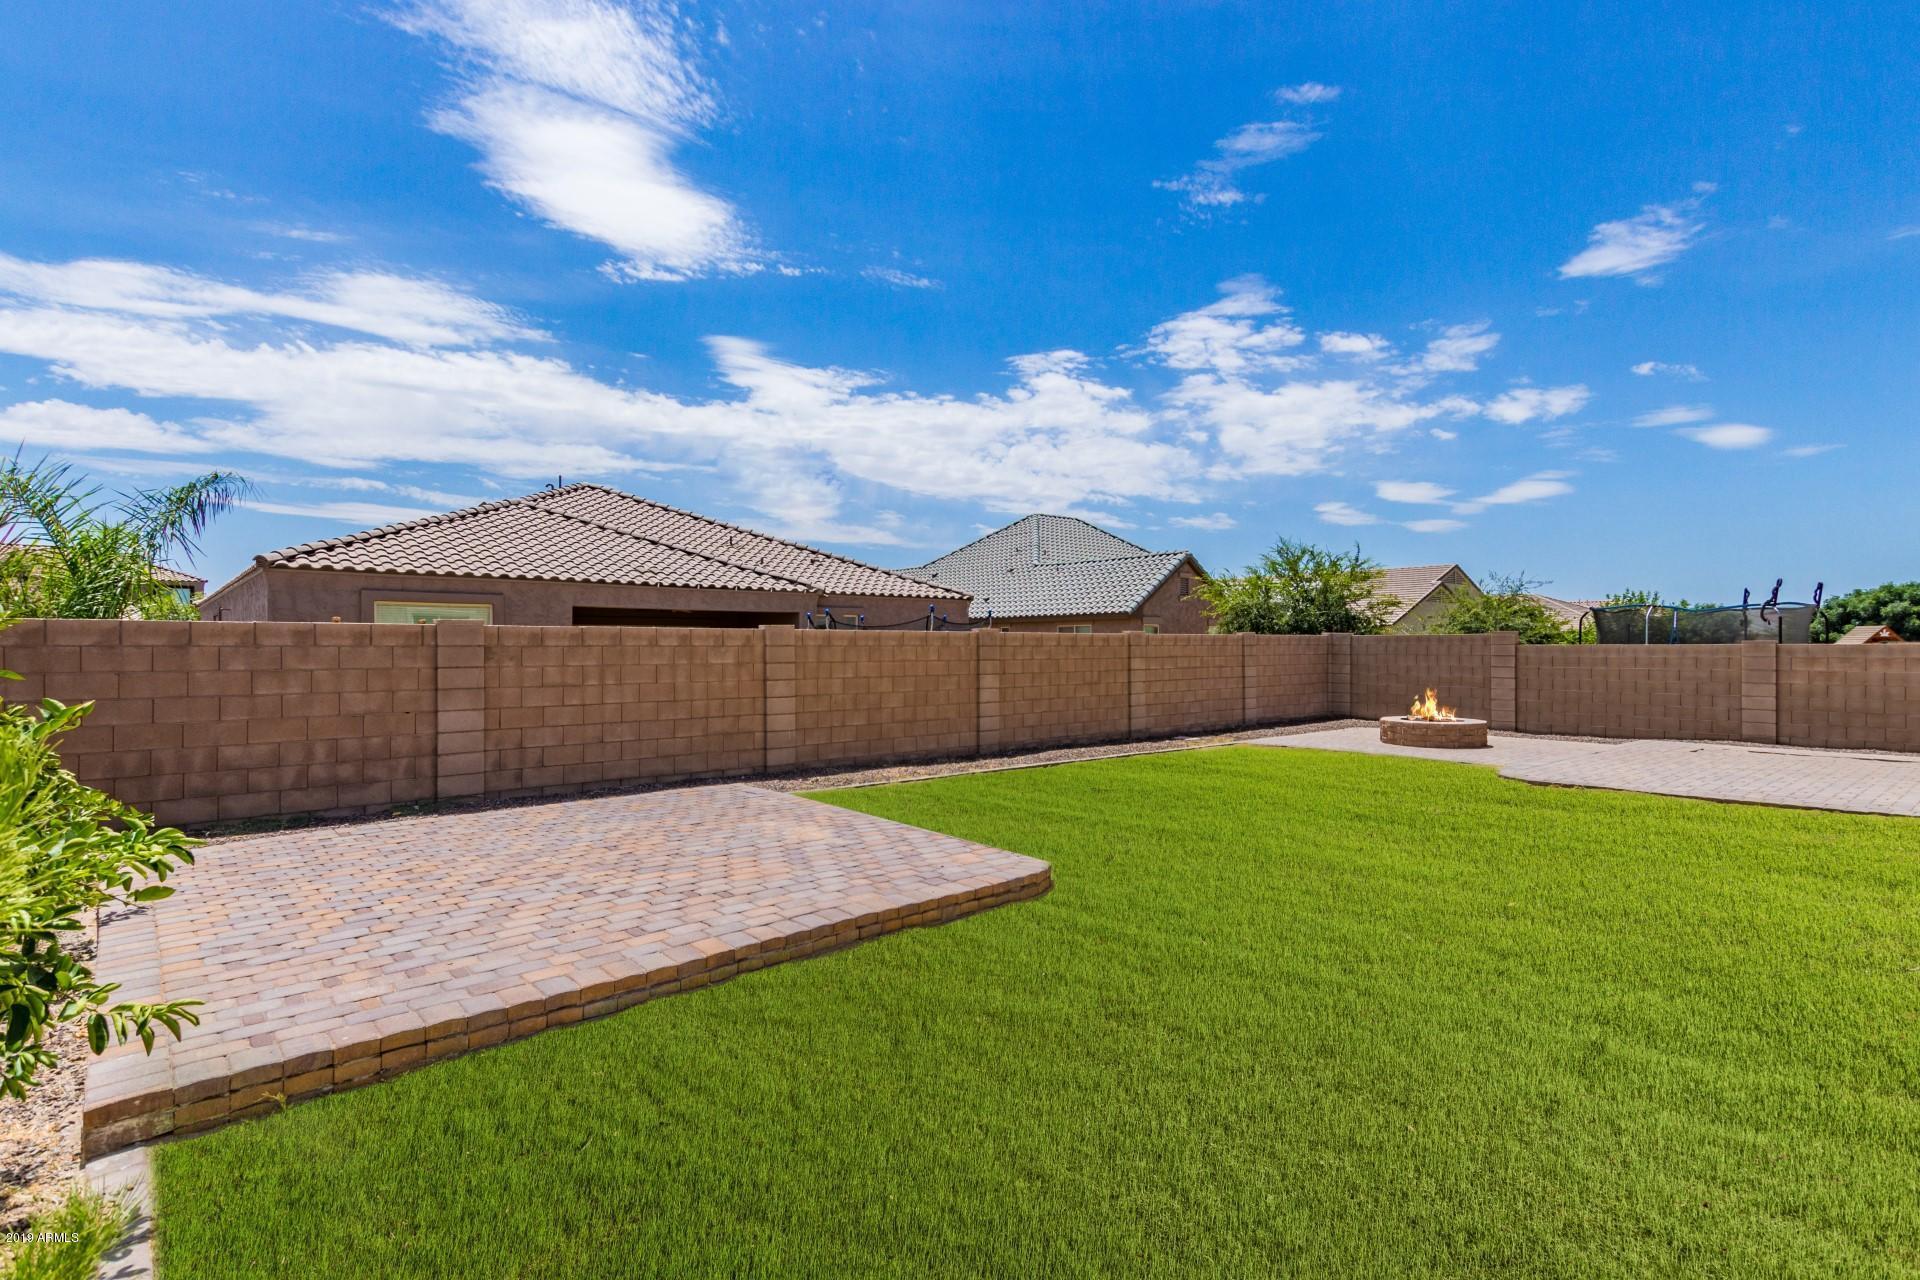 MLS 5953915 22297 E ARROYO VERDE Court, Queen Creek, AZ 85142 Queen Creek AZ Golf